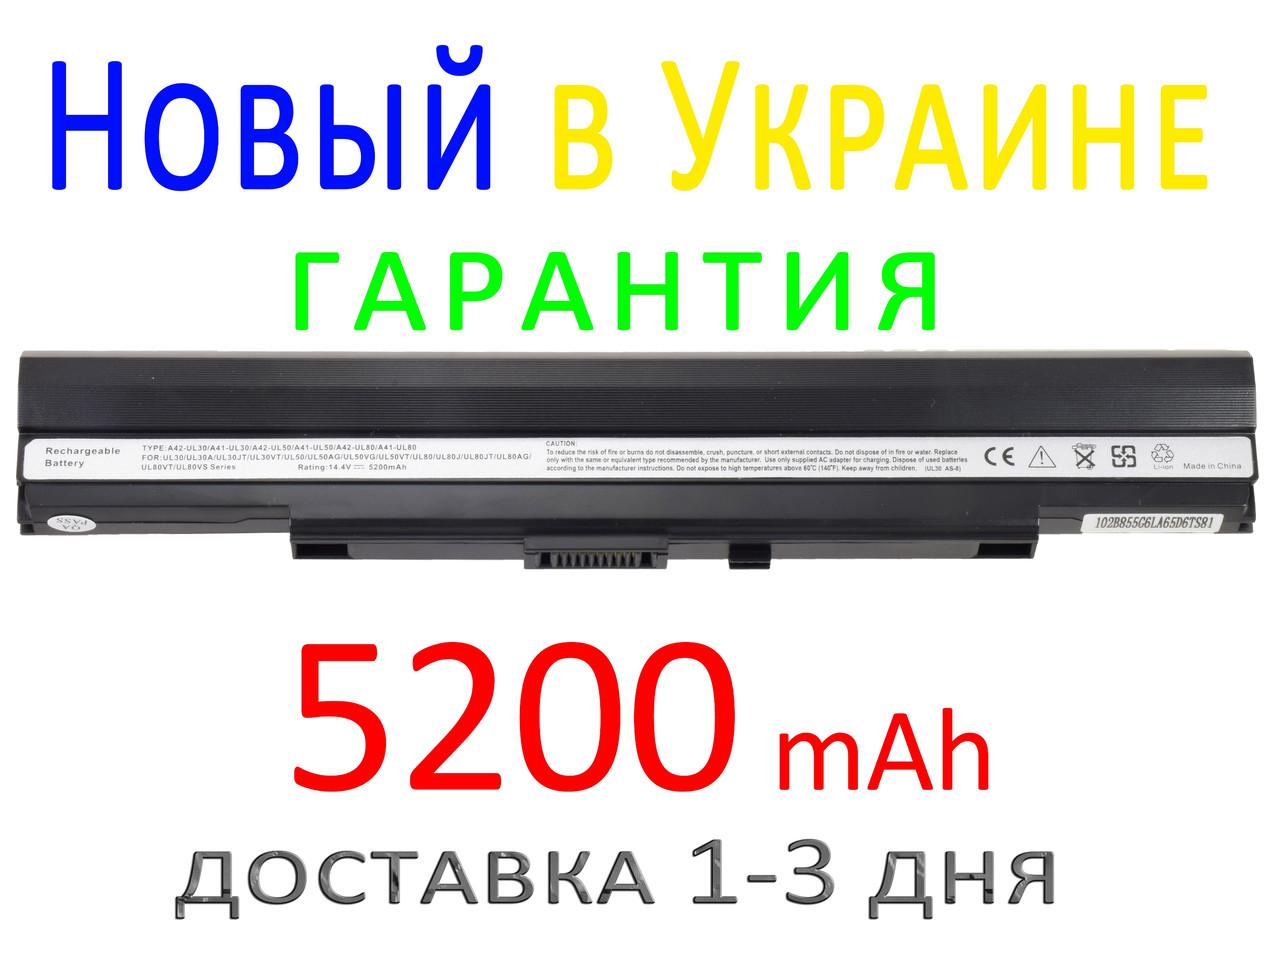 Аккумулятор батарея ASUS UL30 UL50 UL80 U30 A JT VT AG VG J JT VS Jc